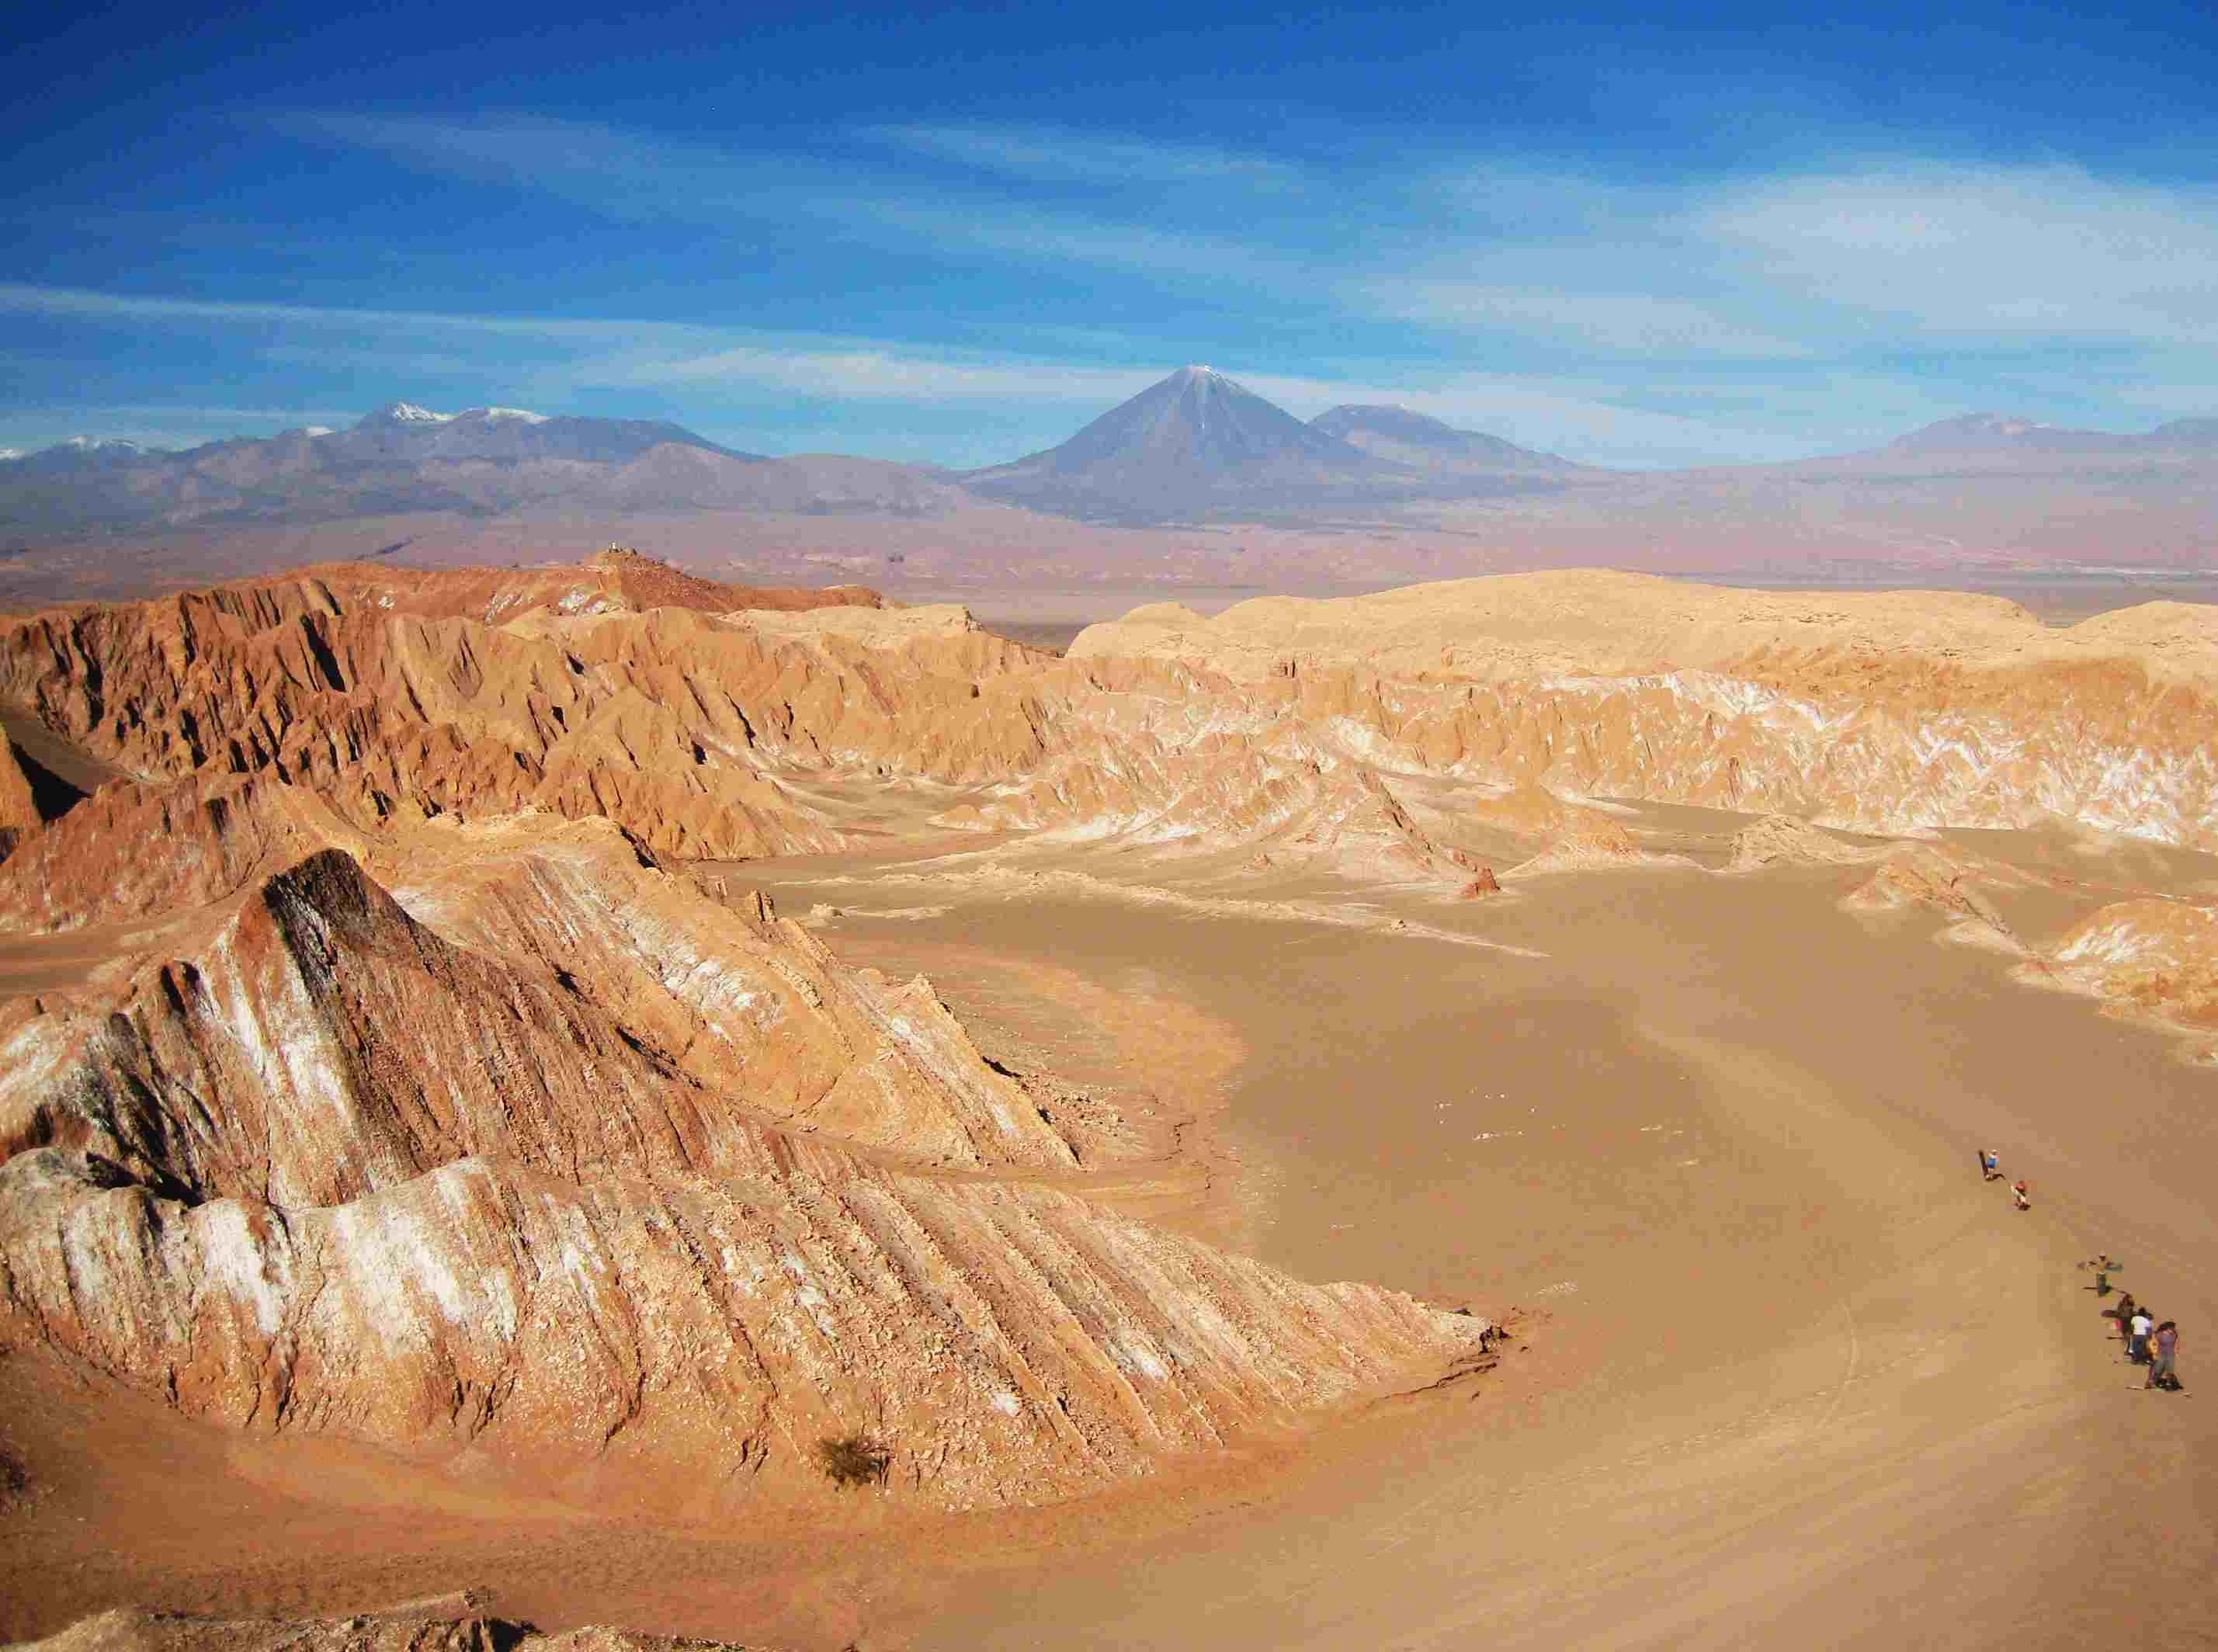 Aerial view of the Atacama Desert